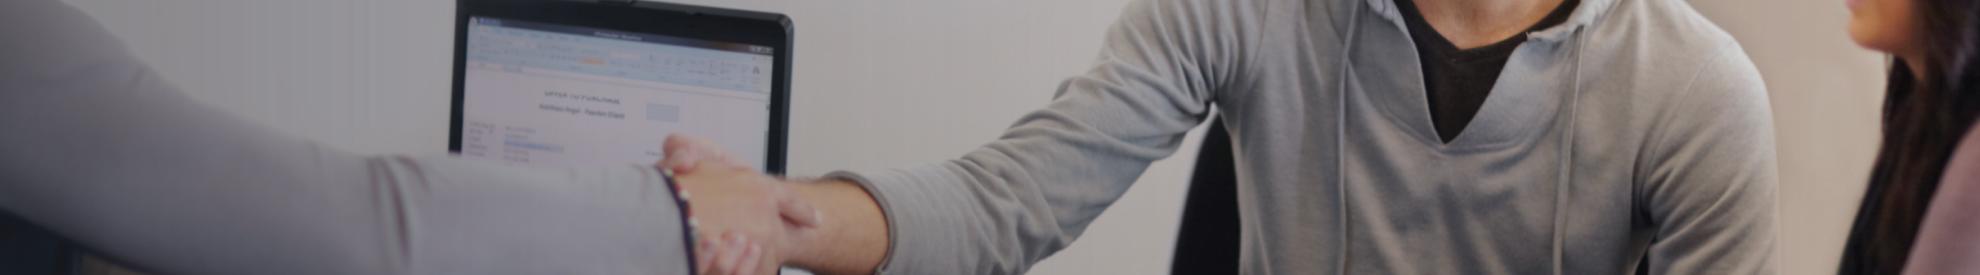 Sales Handshake